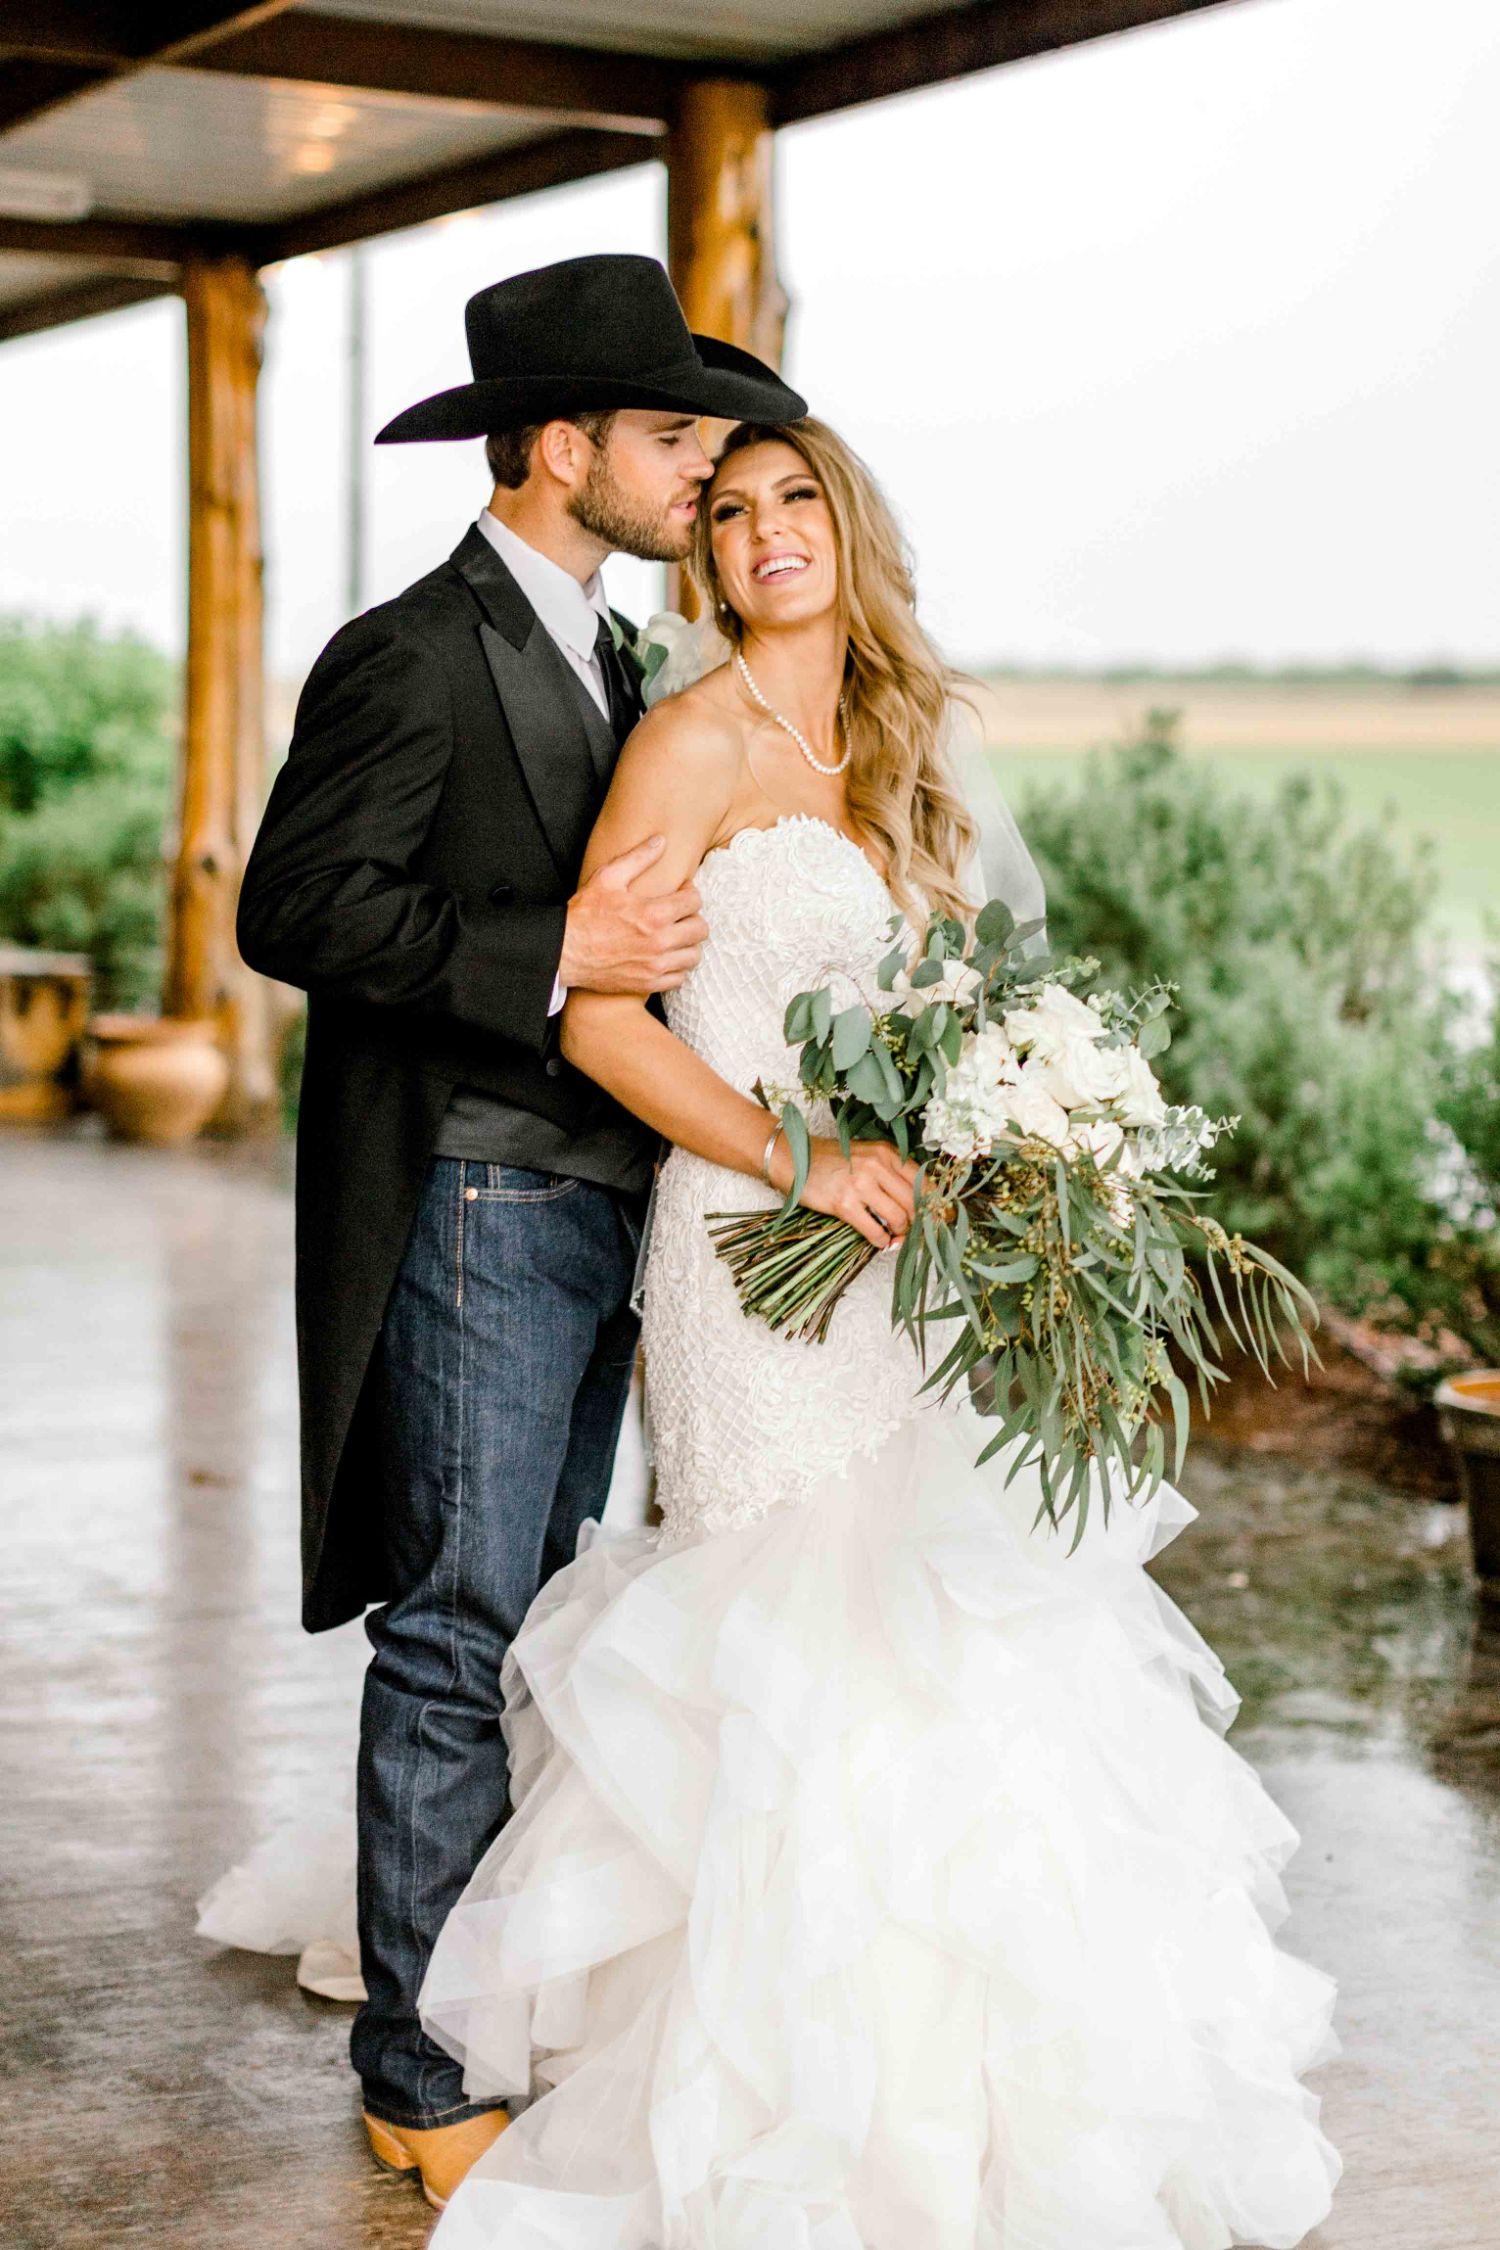 wichita-falls-wedding-katelyn-colten-vernon-texas-34.jpg